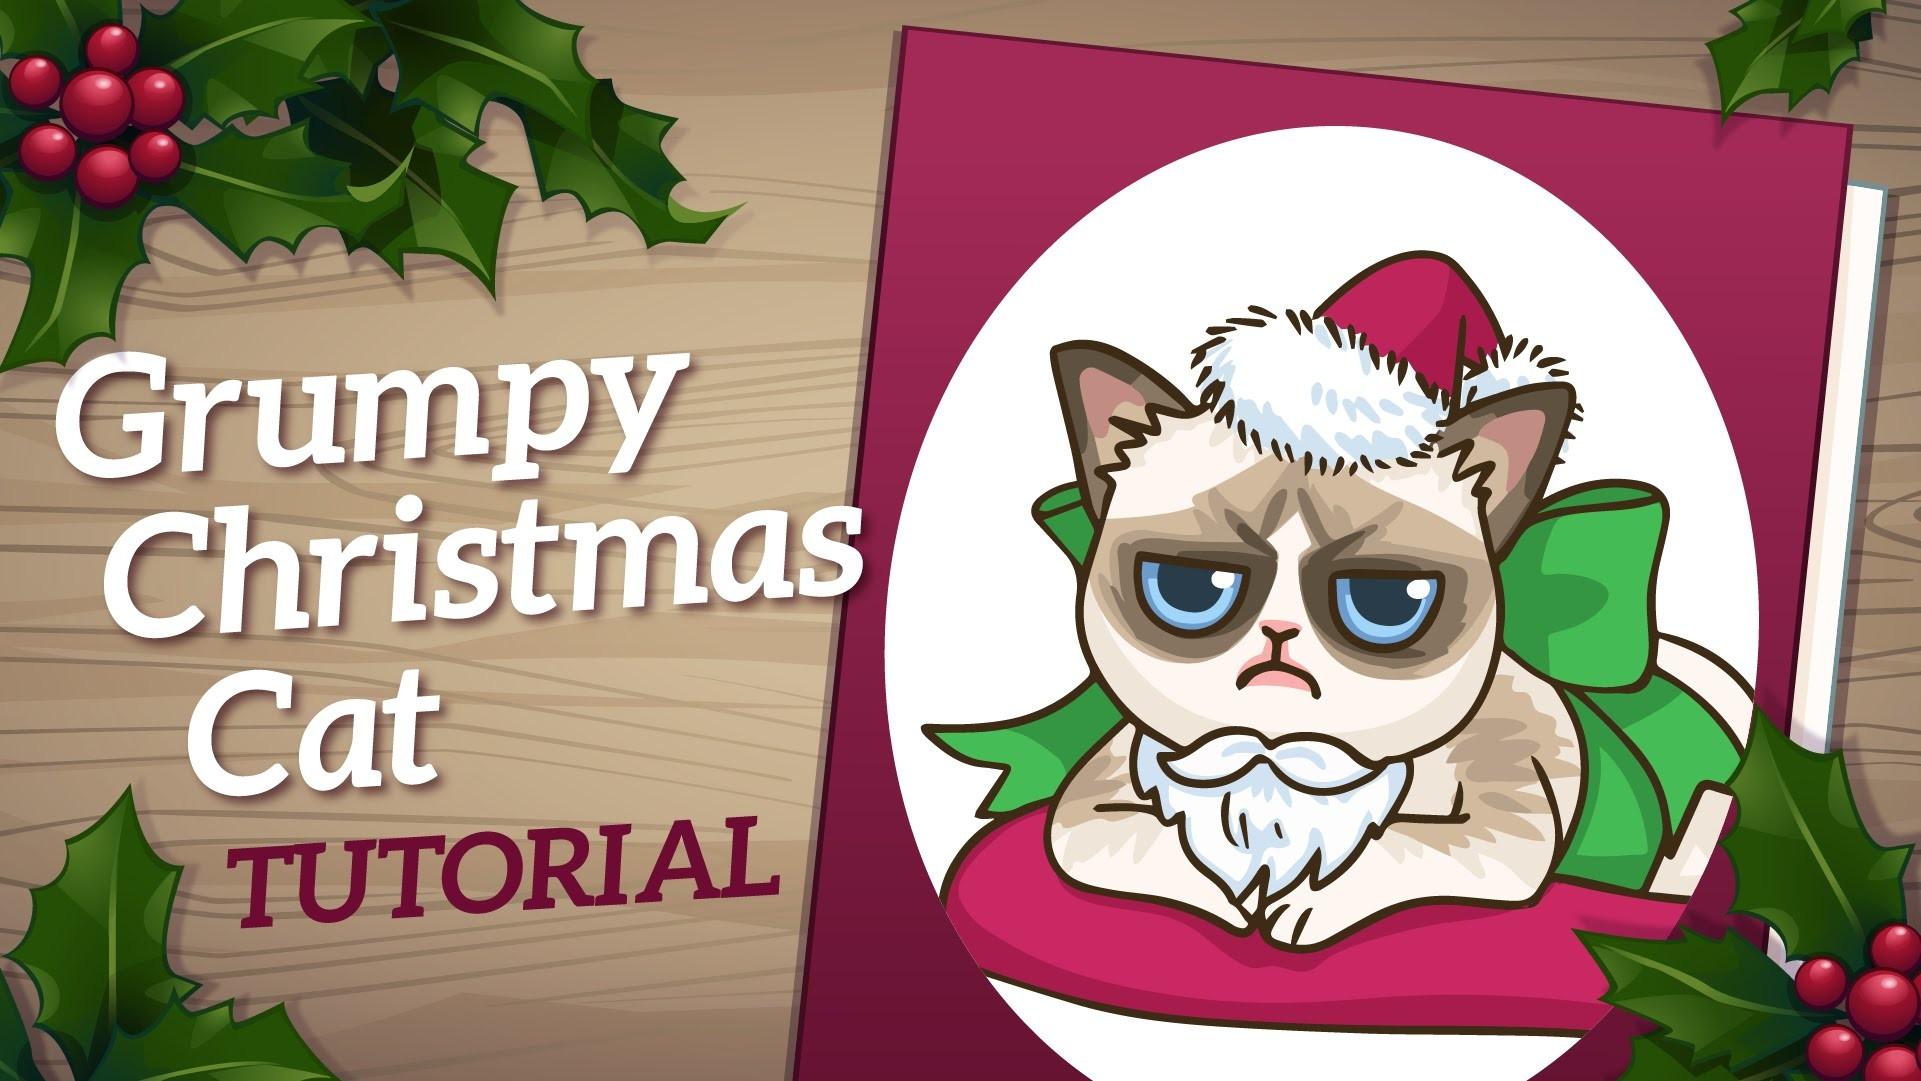 Grumpy Cat Art Tutorial - How to Draw Christmas Card Art